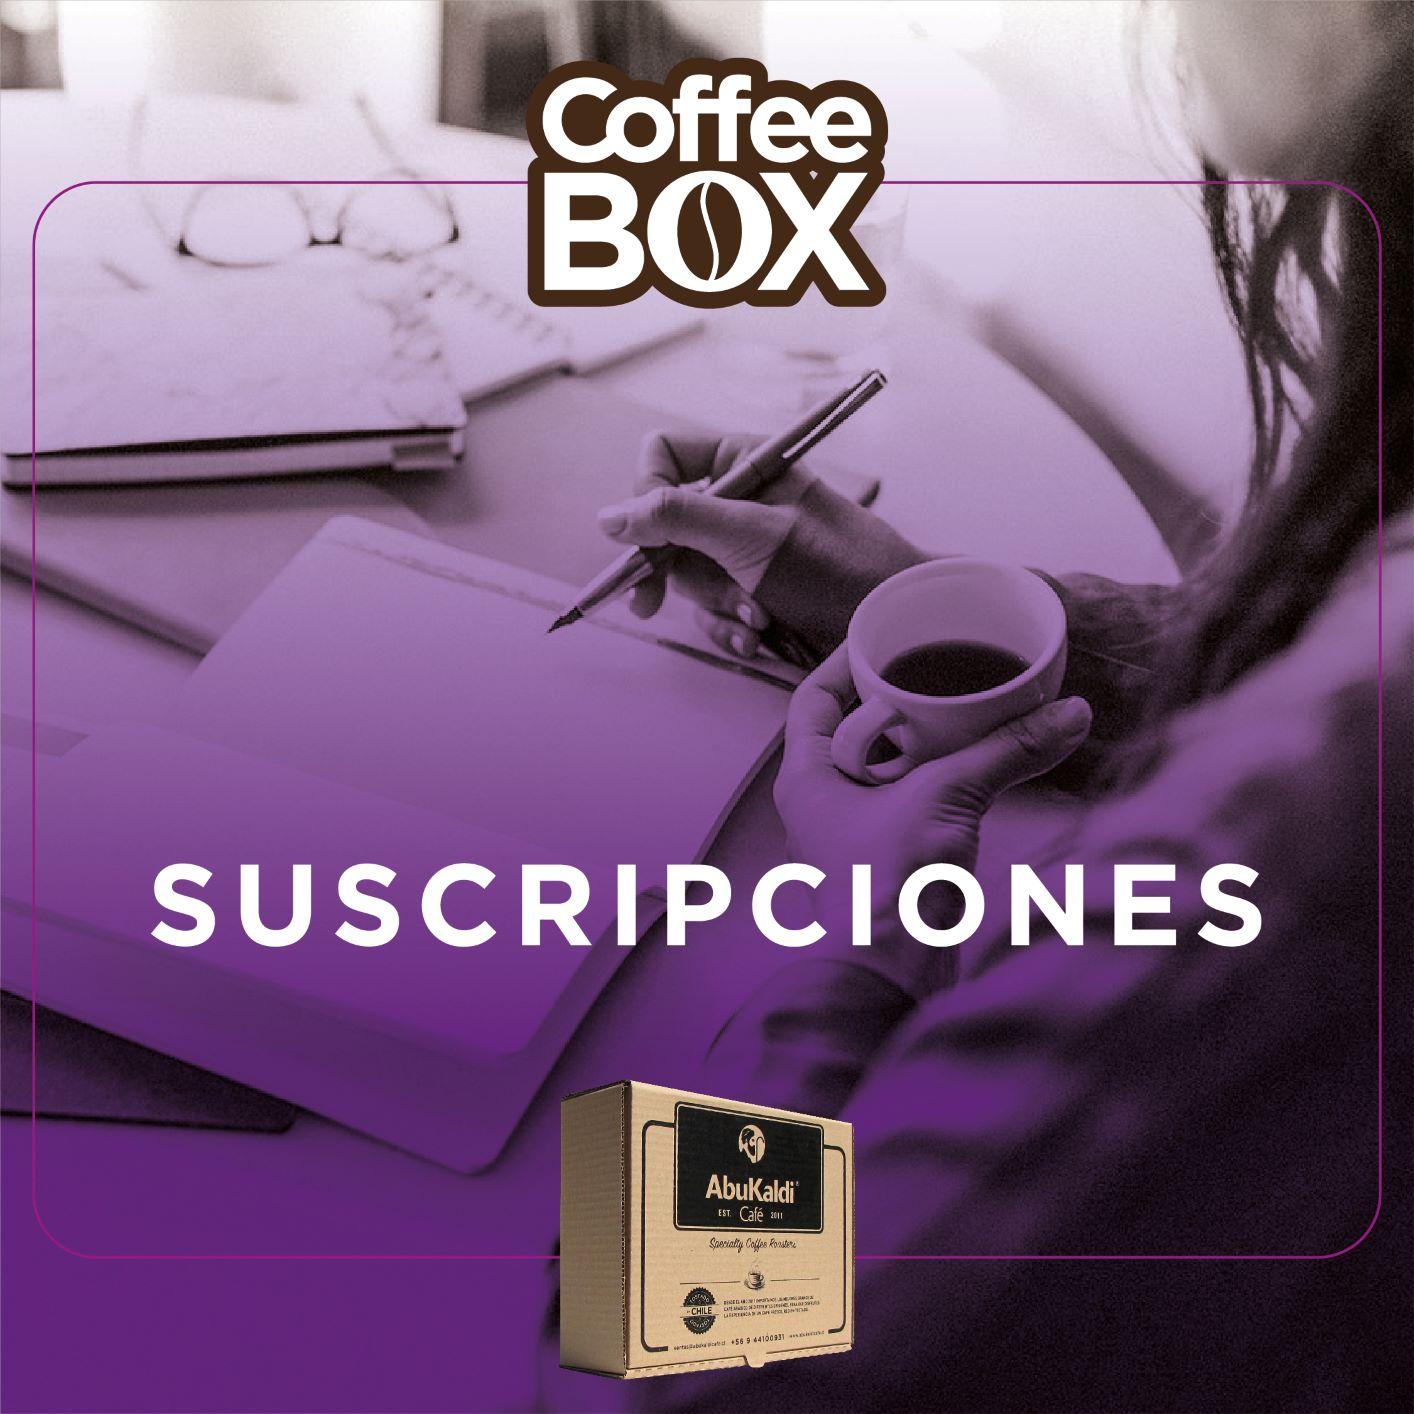 Coffee Box Suscripciones